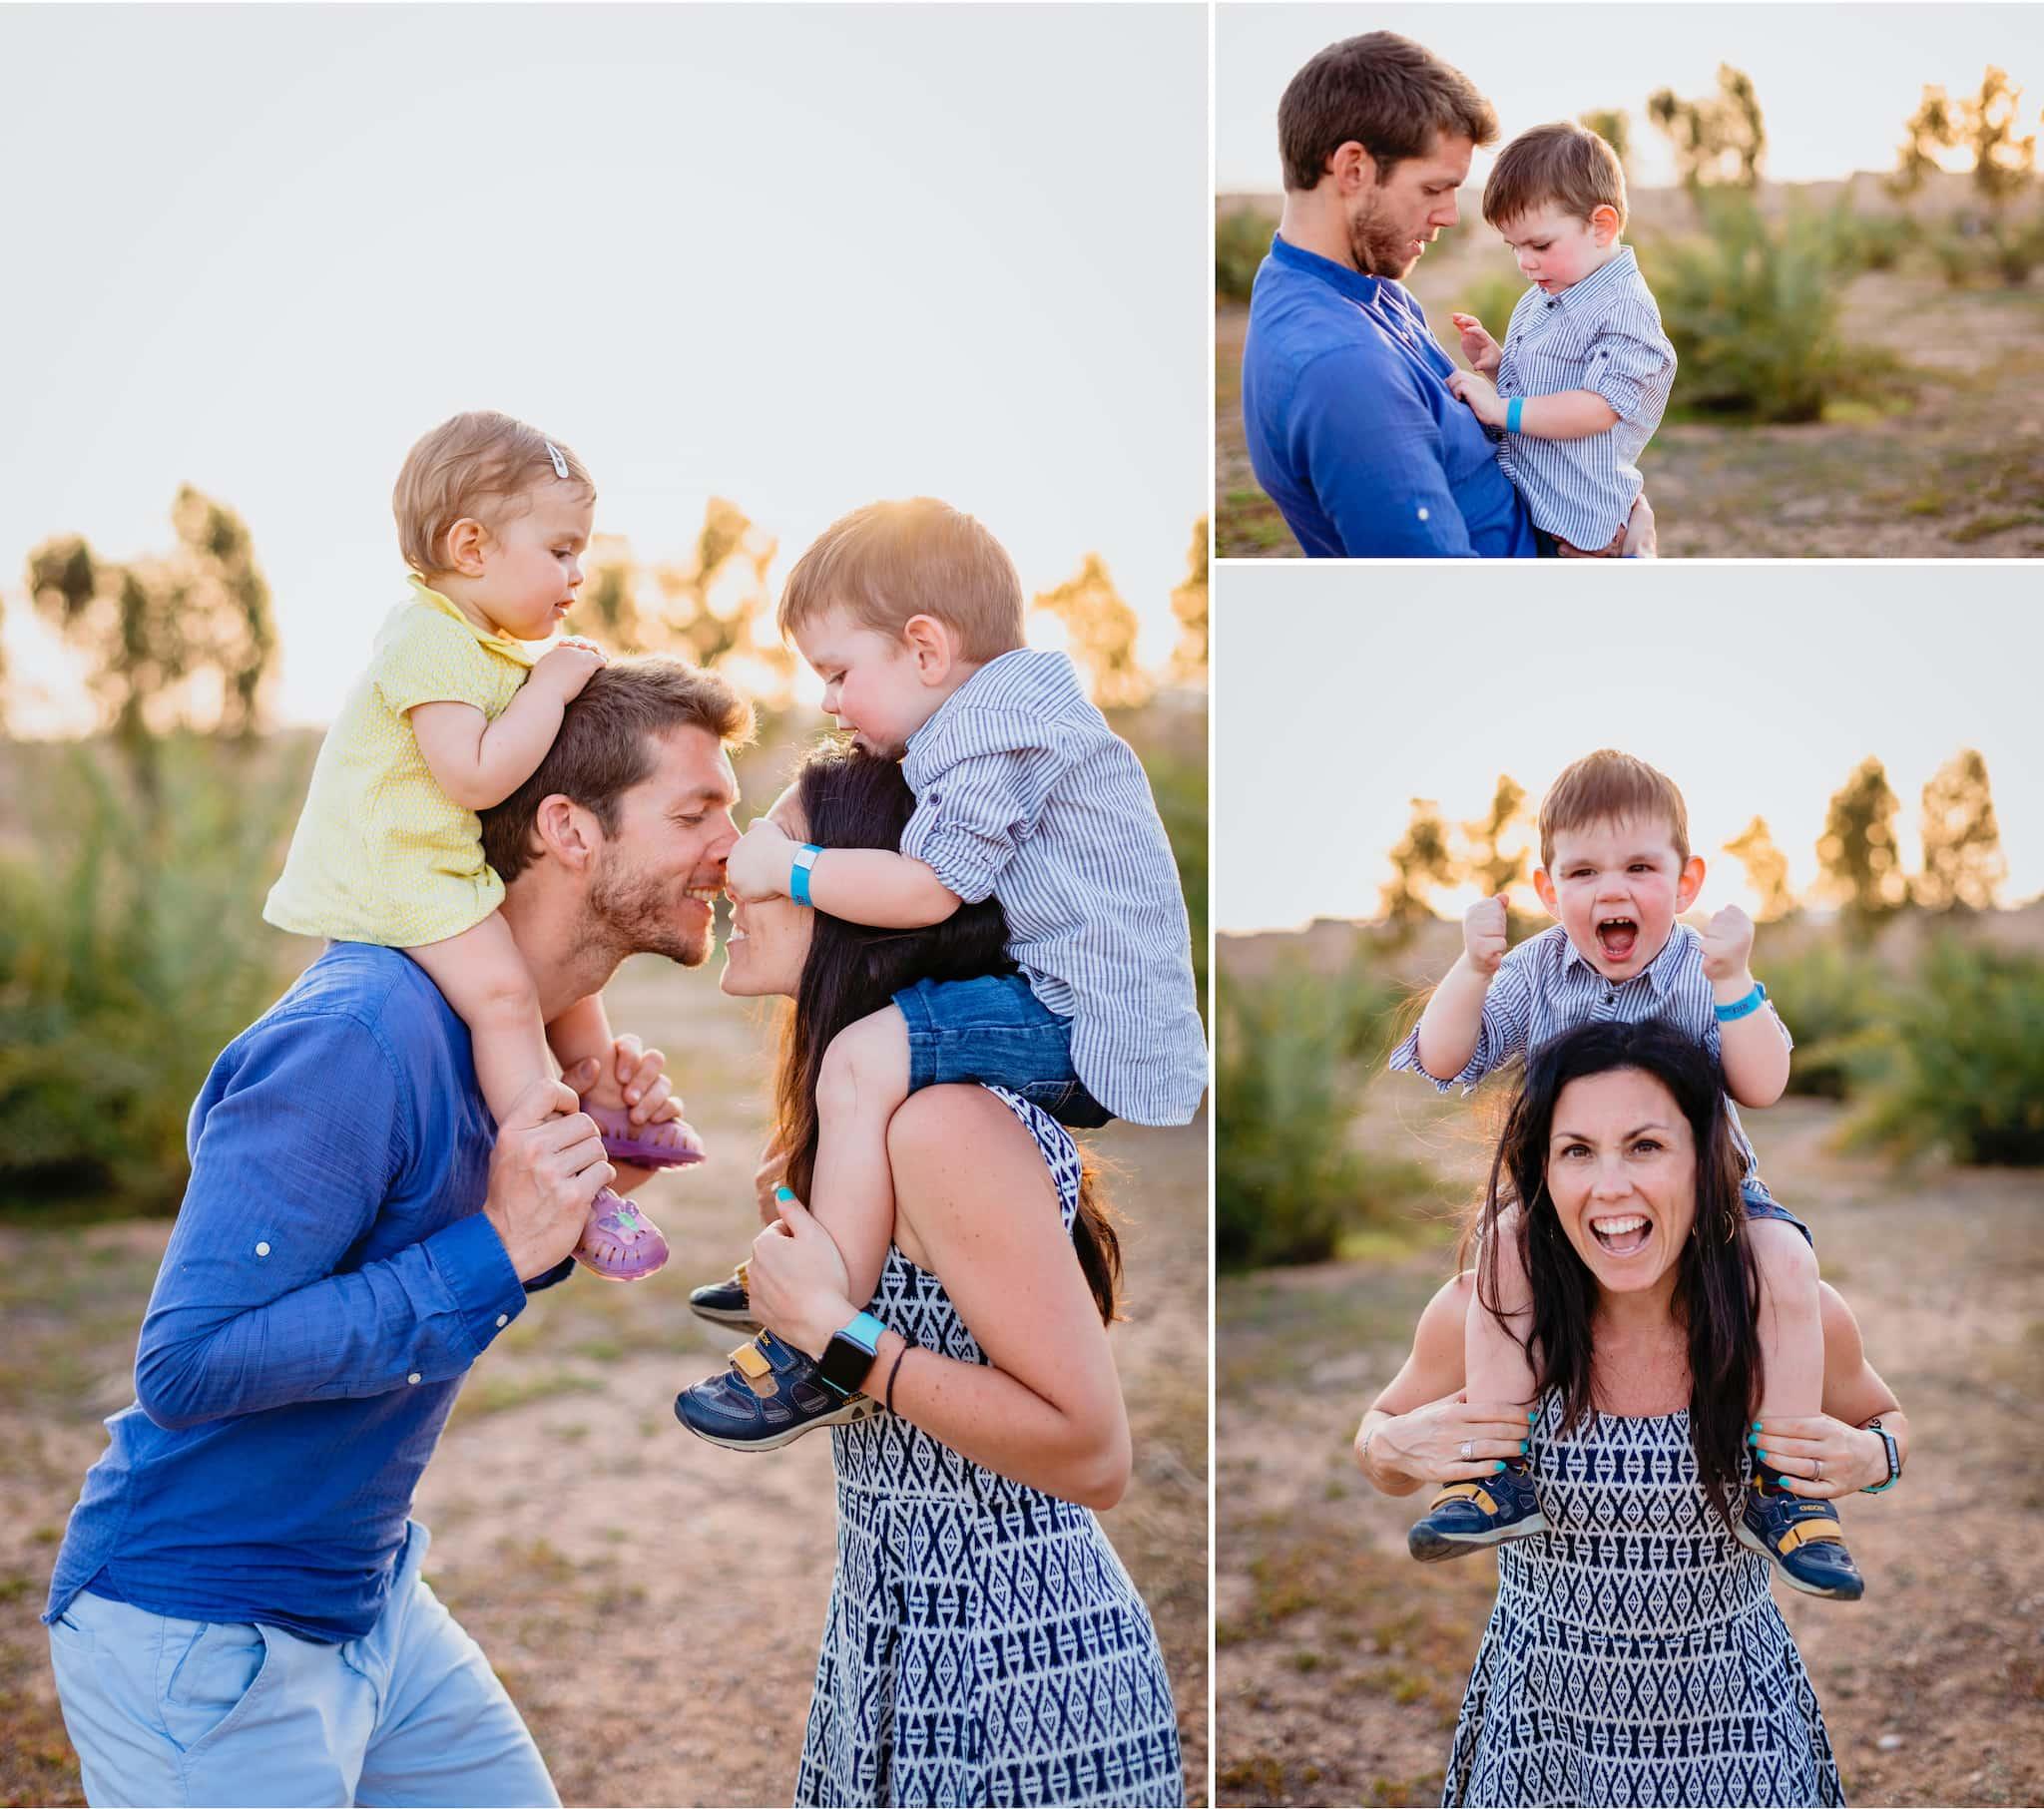 marrakesh ; maroc ; photographe ; séance photo famille